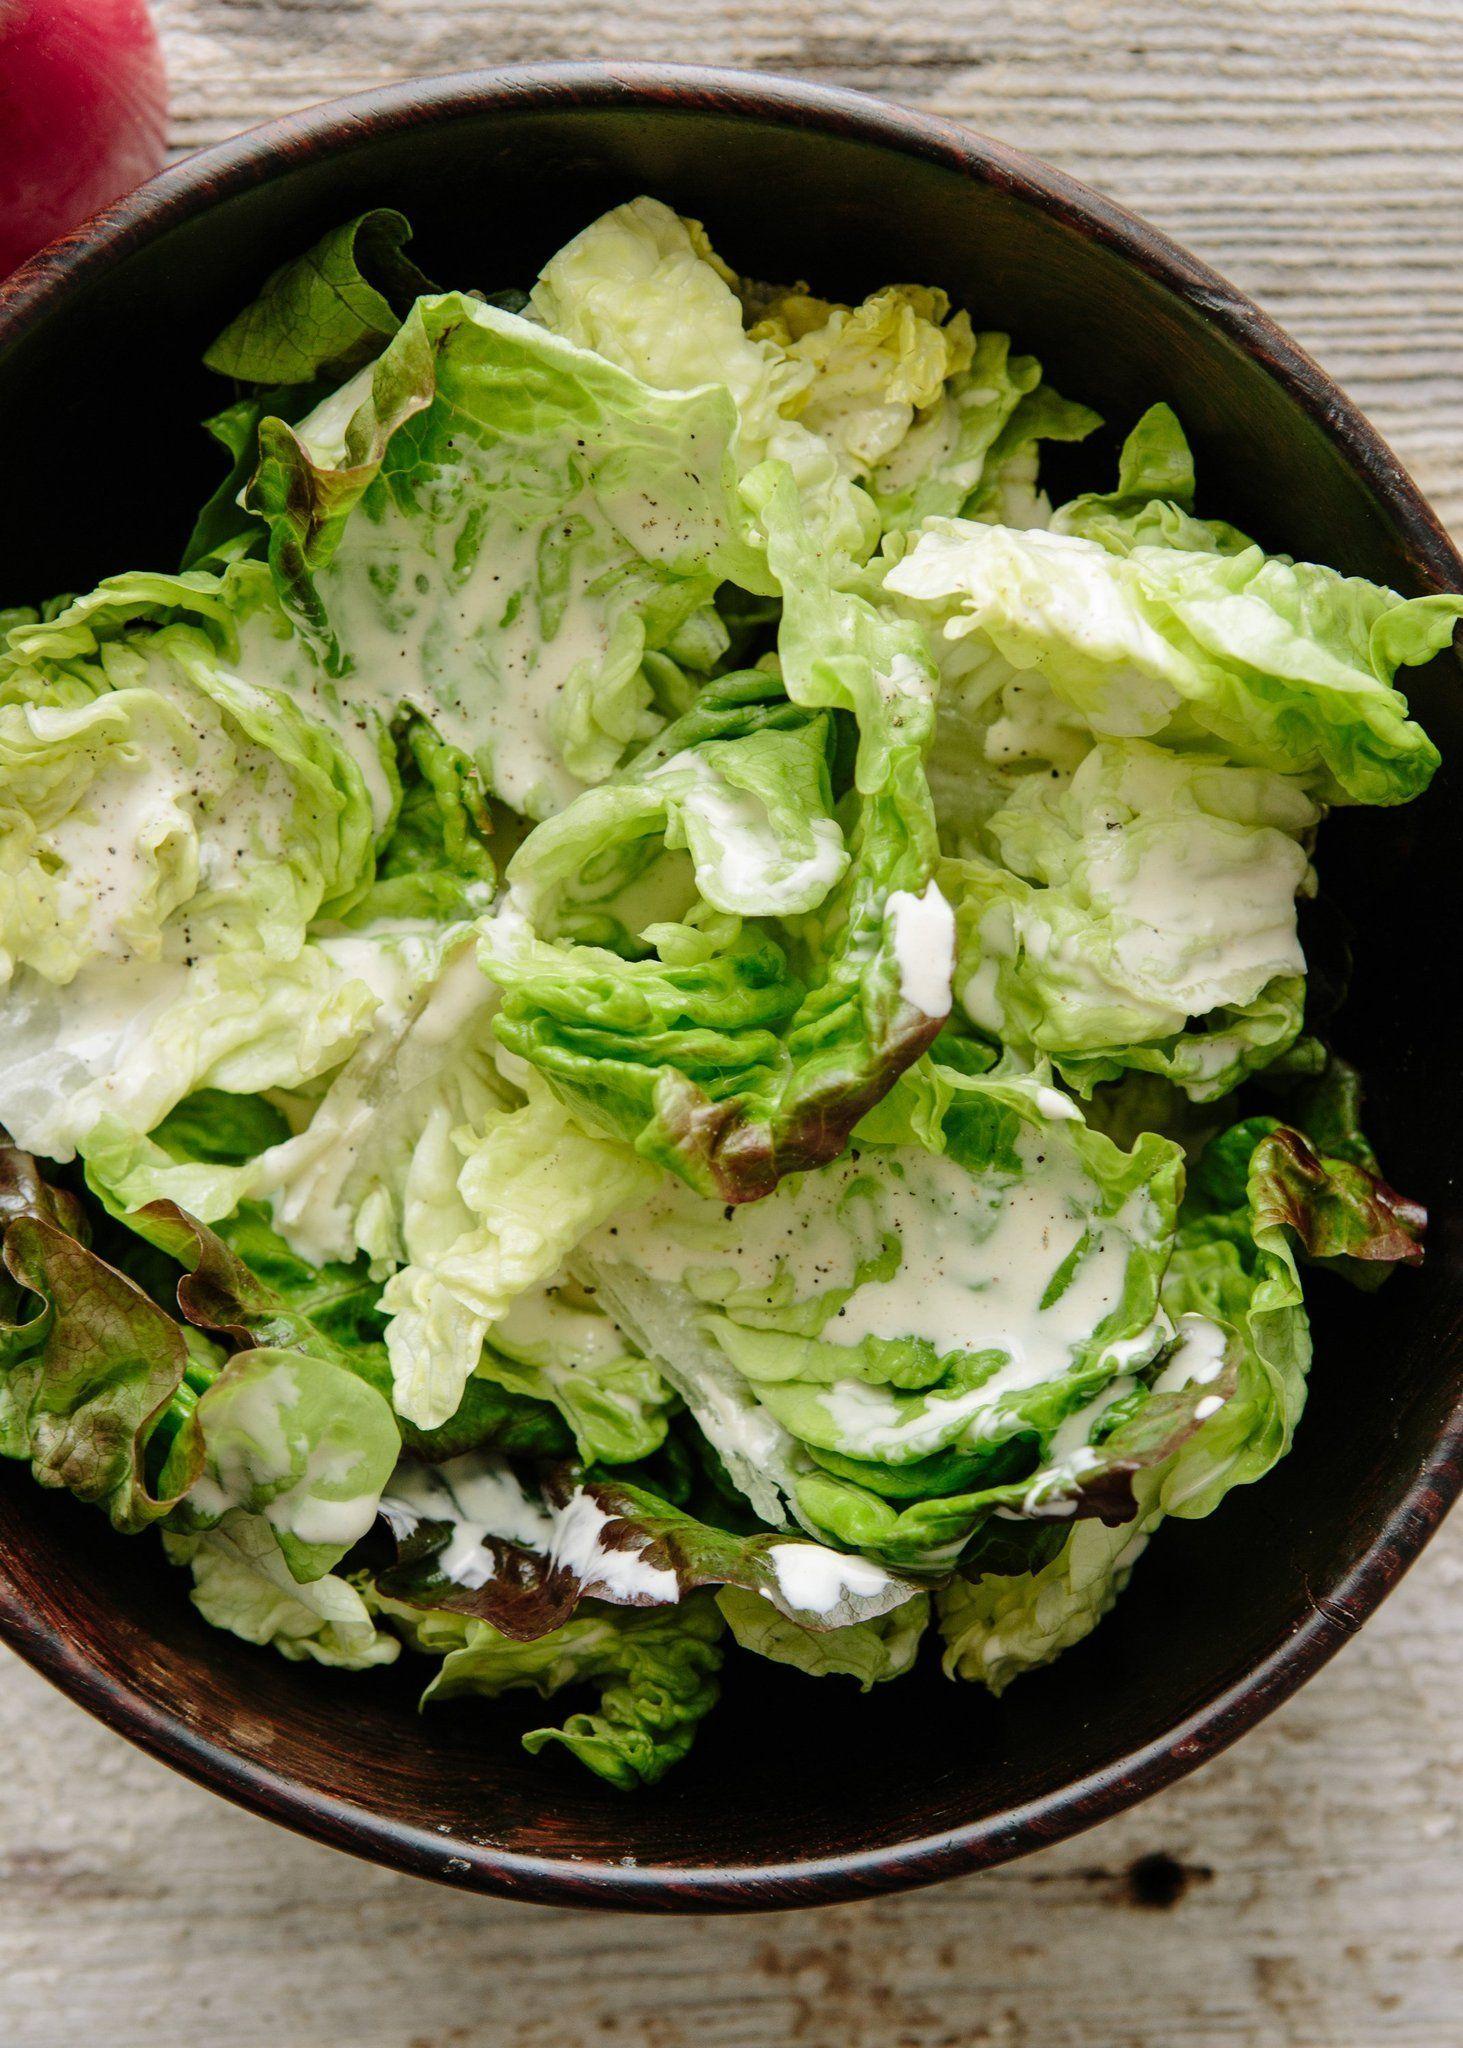 Recipe Two Minute Creamy Salad Dressing Recipe Creamy Salad Dressing Salad Dressing Recipes Homemade Salads [ 2048 x 1463 Pixel ]